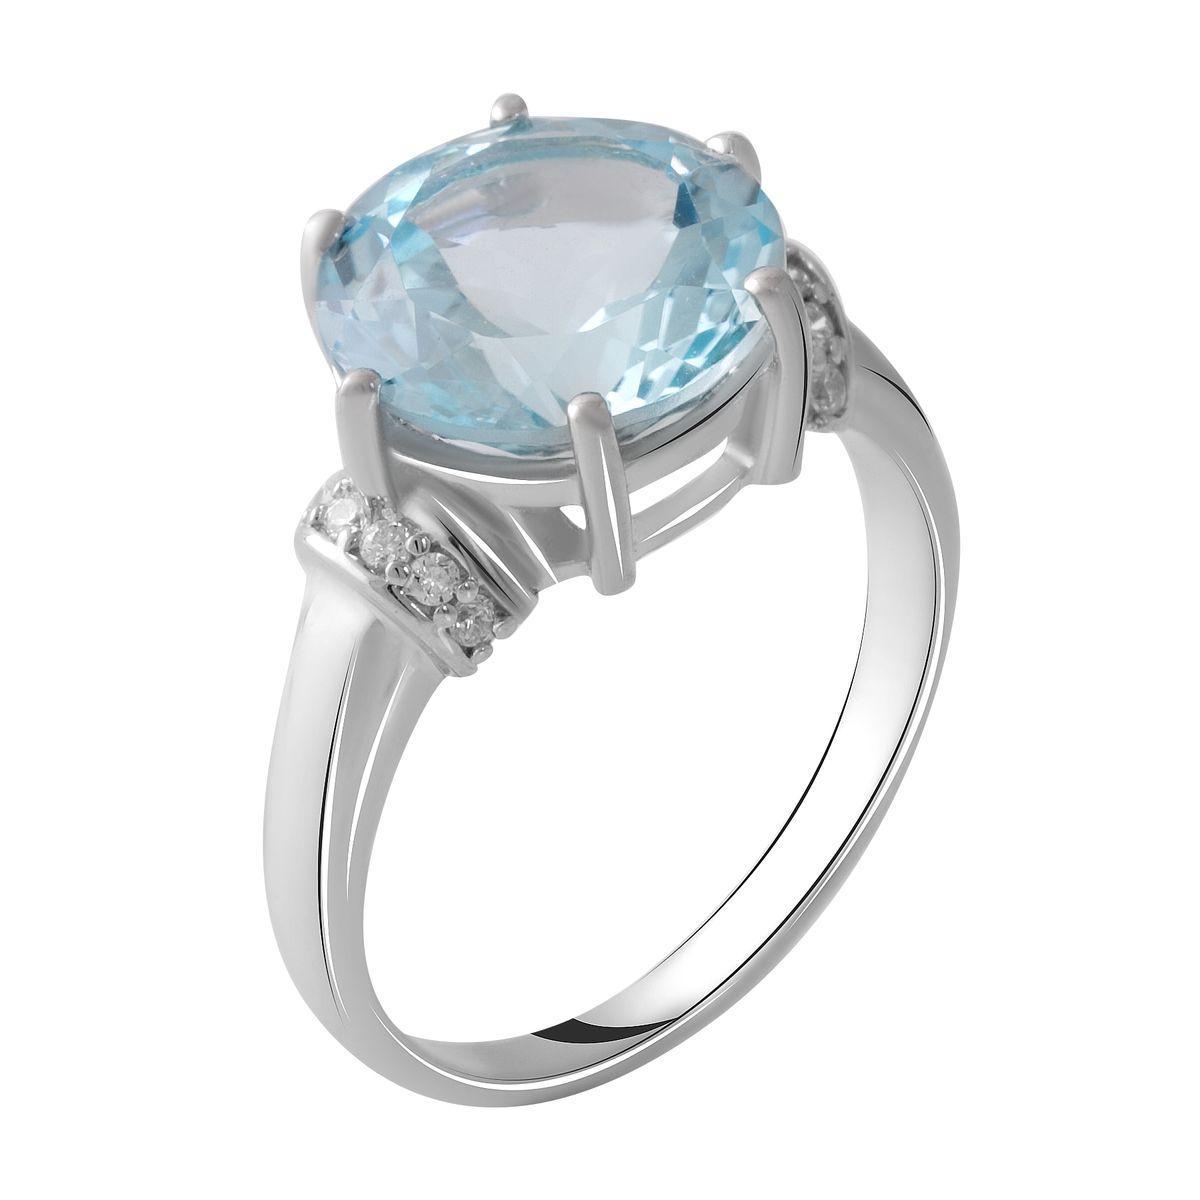 Серебряное кольцо DreamJewelry с натуральным топазом 3.28ct (2049463) 18 размер